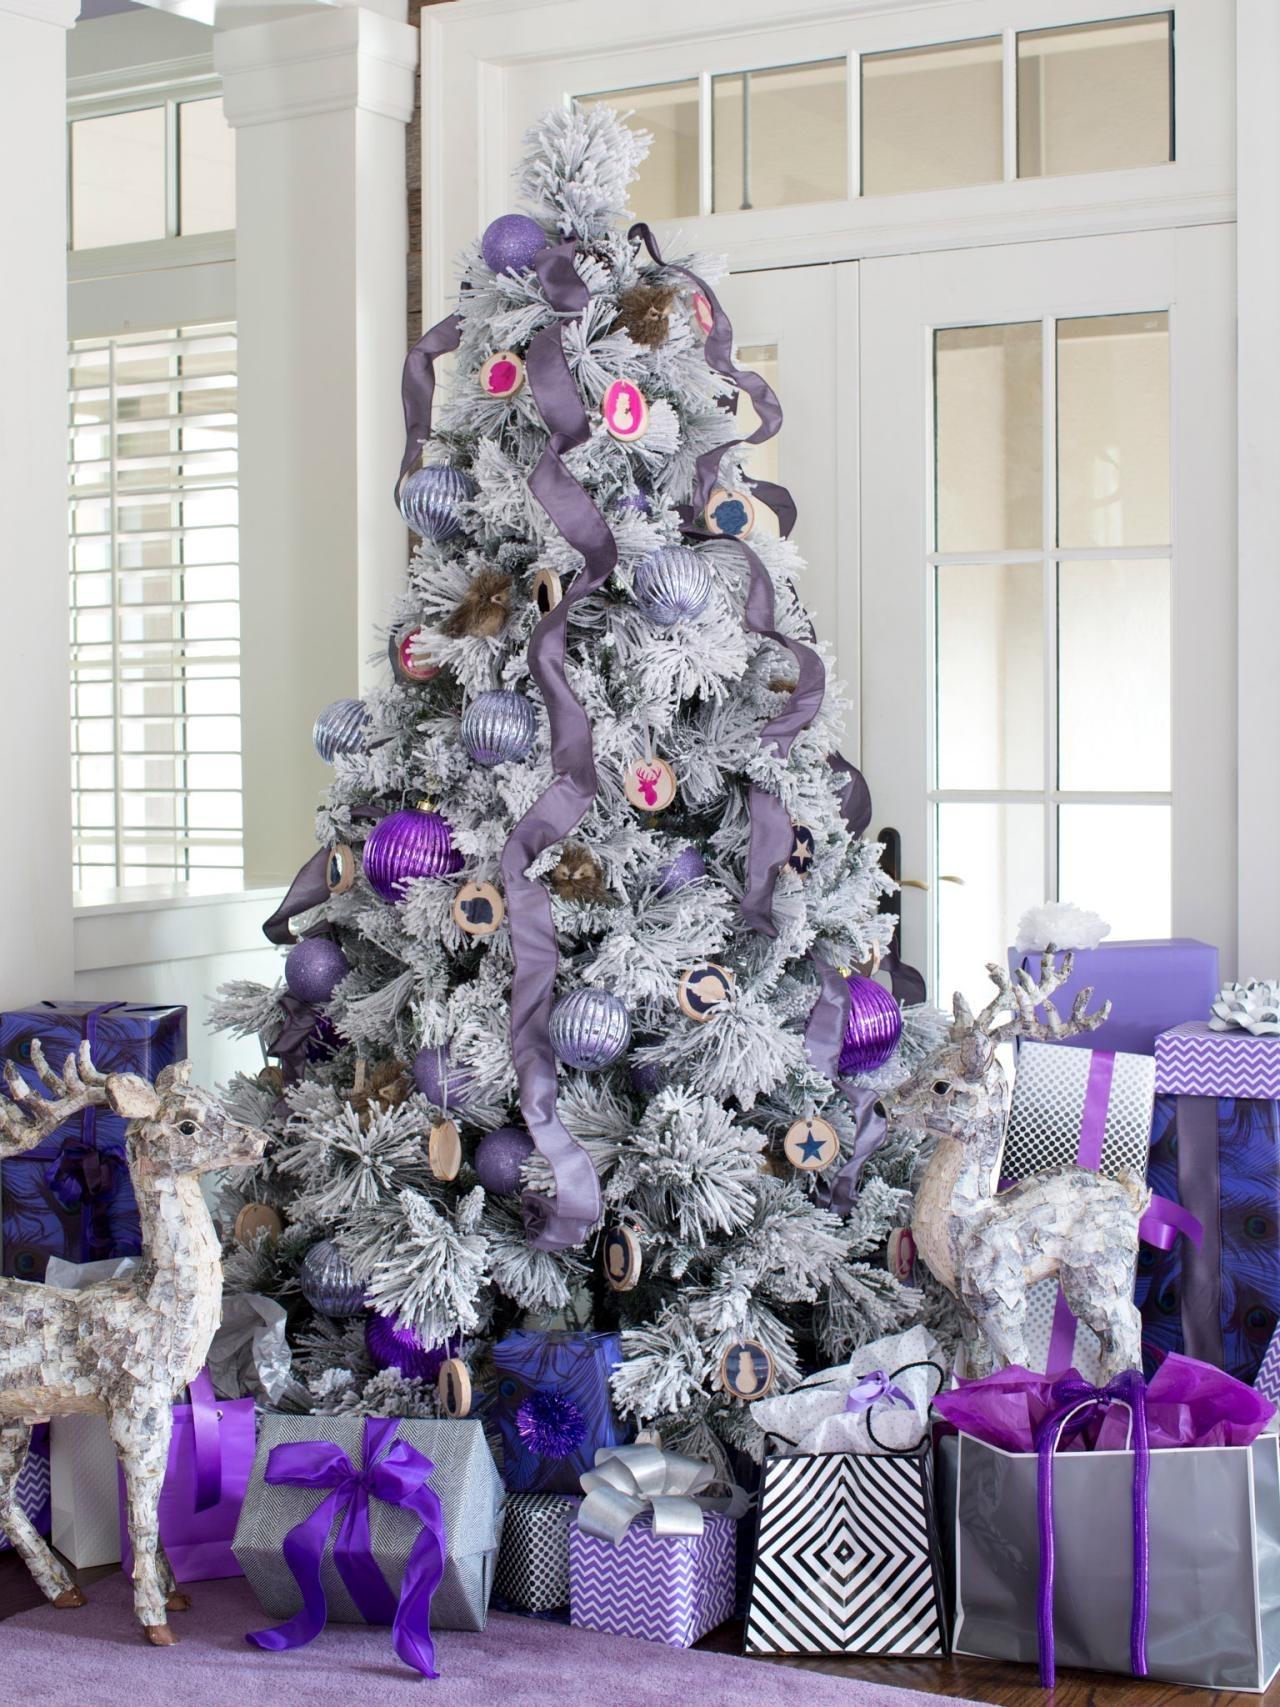 10 Attractive Hgtv Christmas Tree Decorating Ideas %name 2020